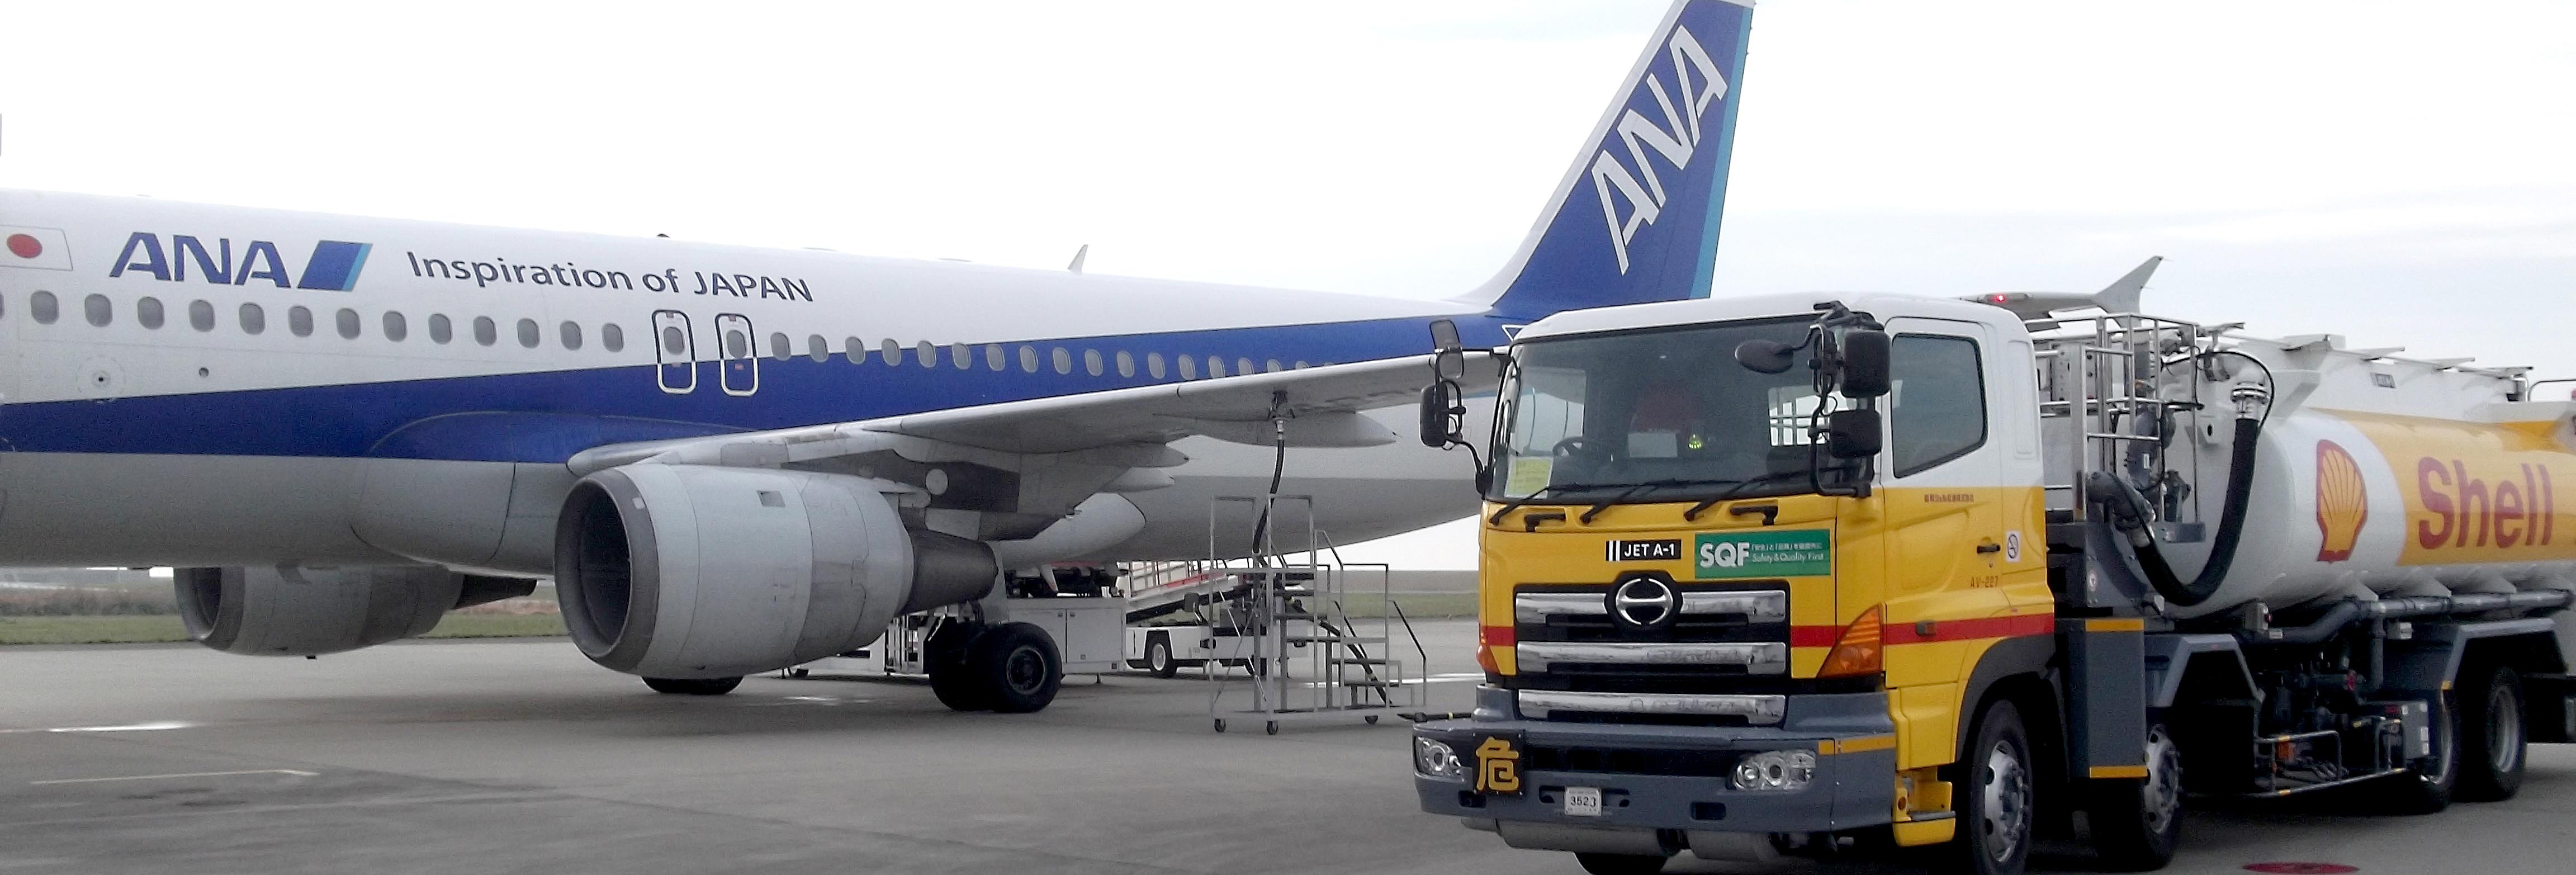 airport07